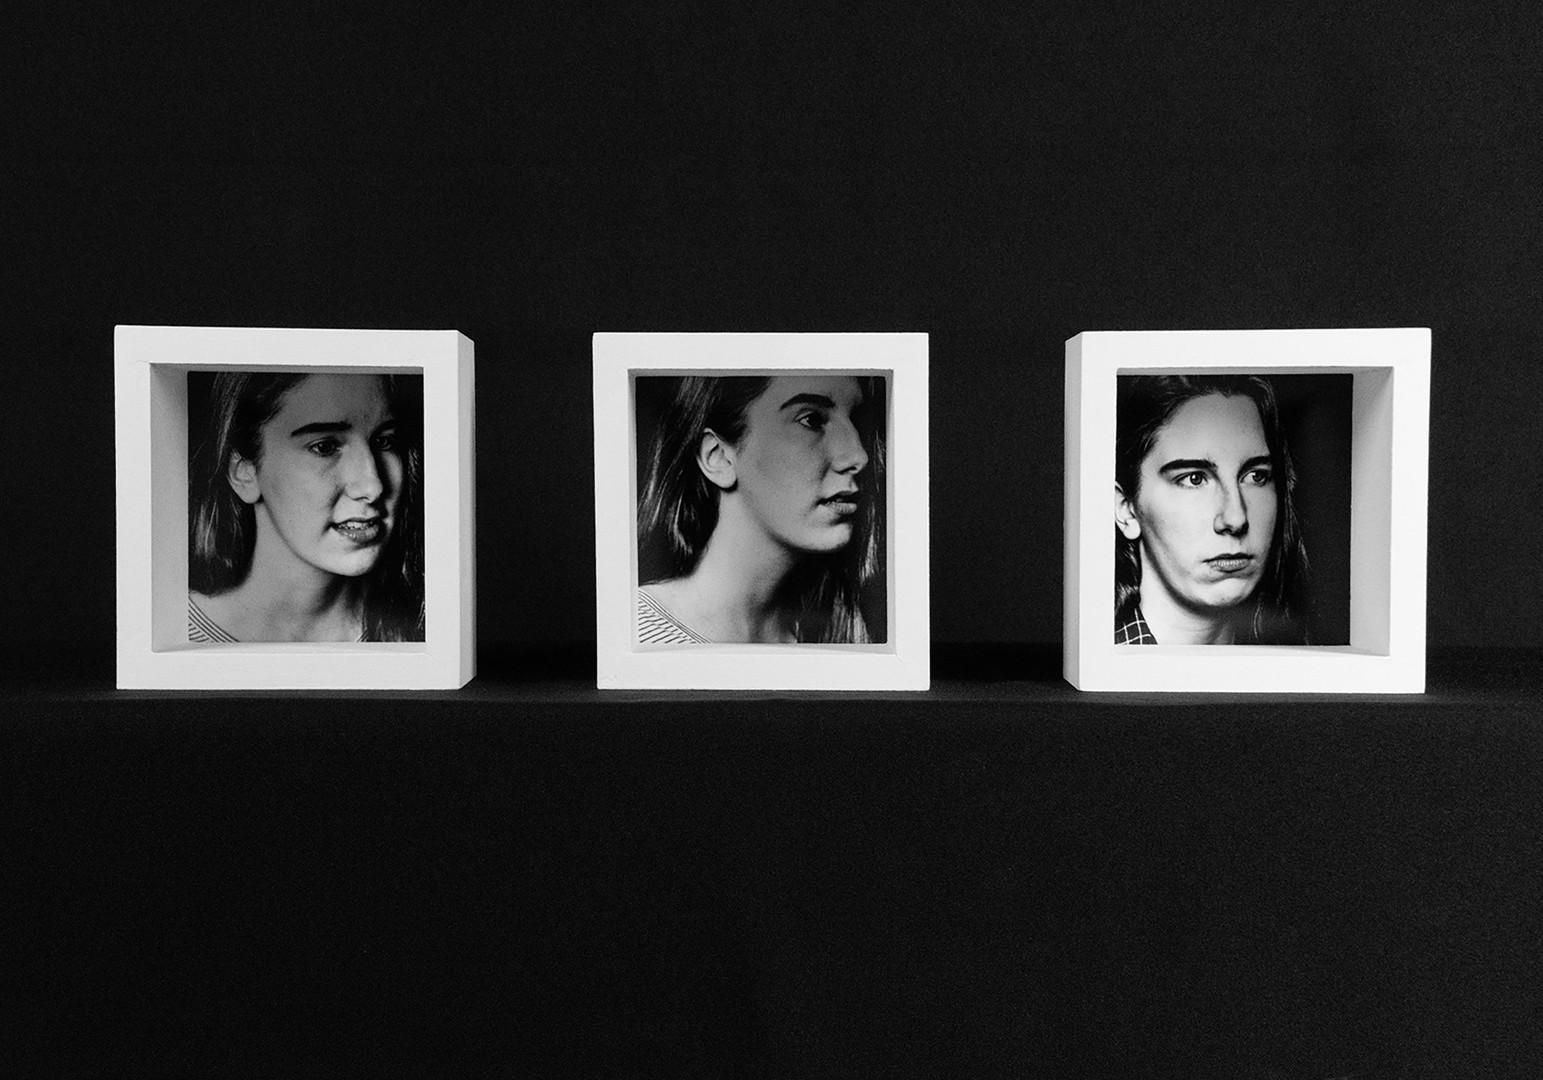 Meagan Emotions